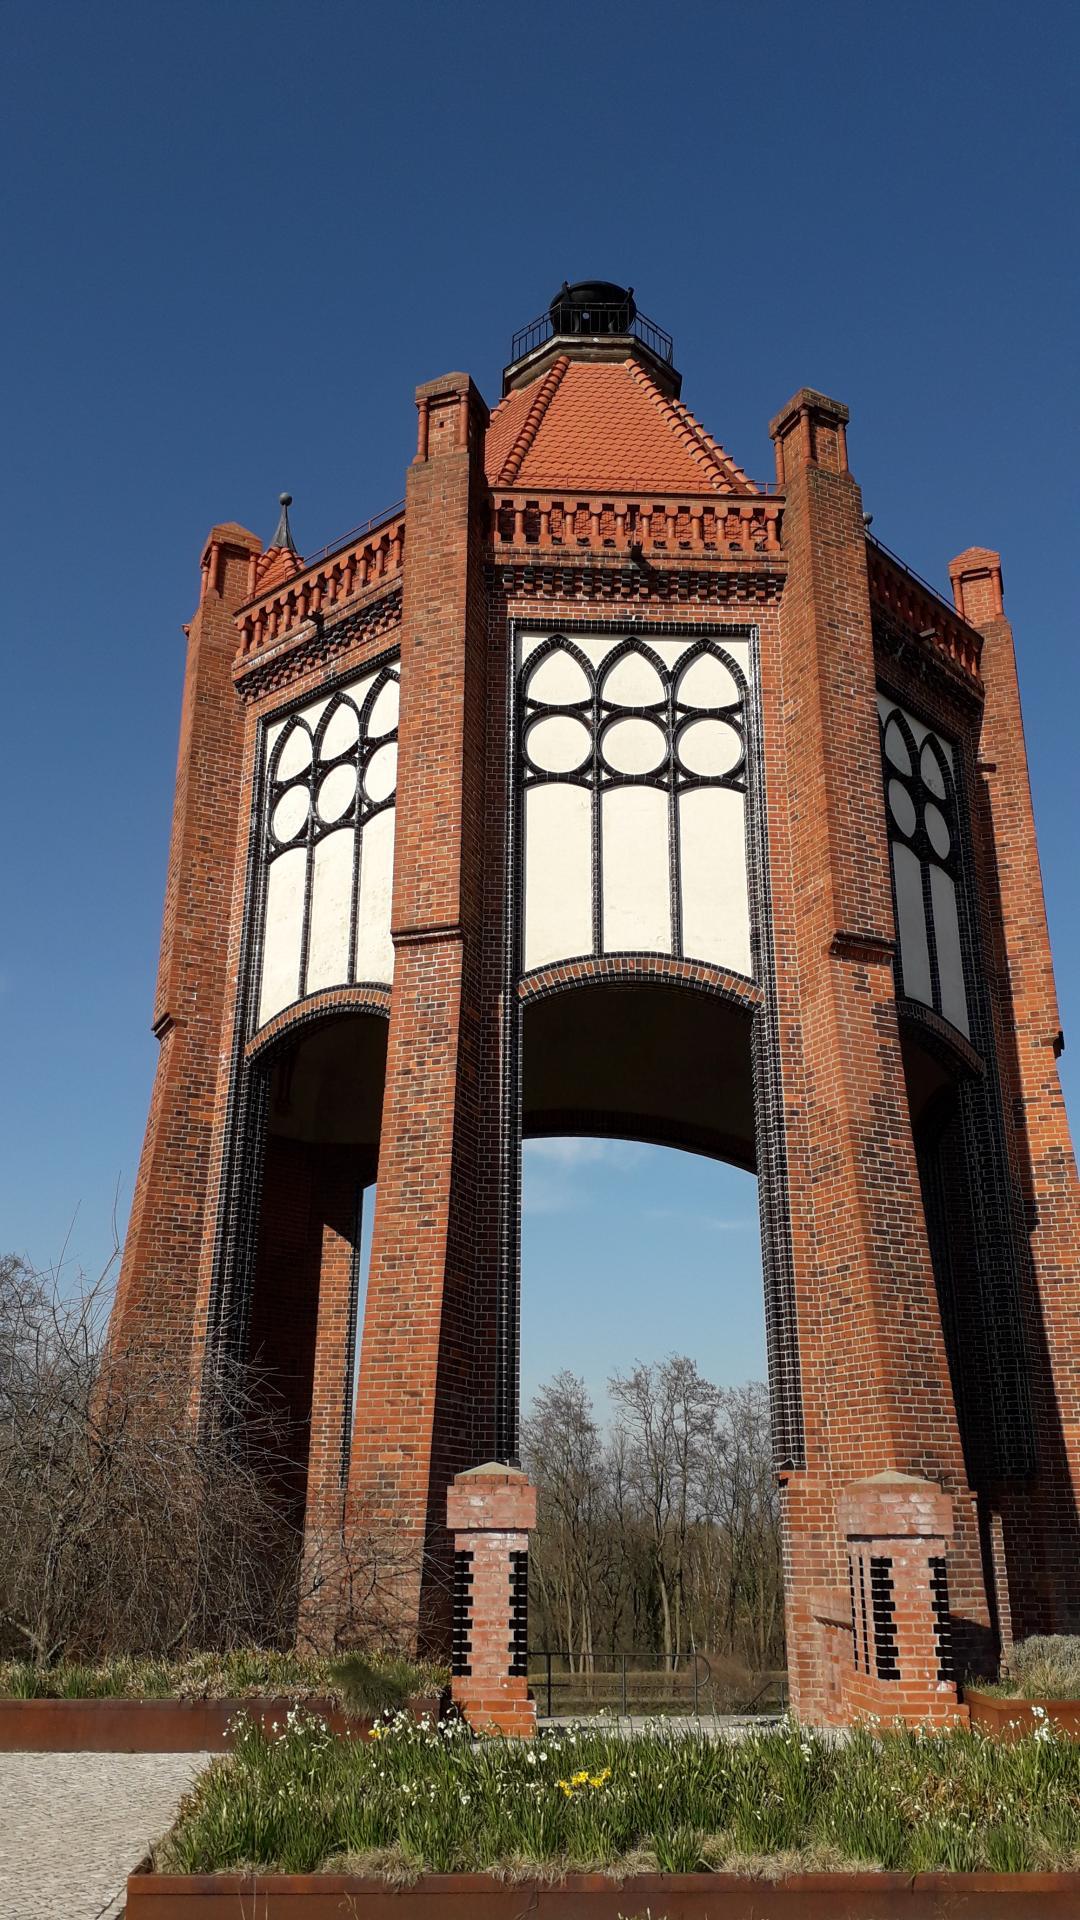 Rathenow Bismarckturm